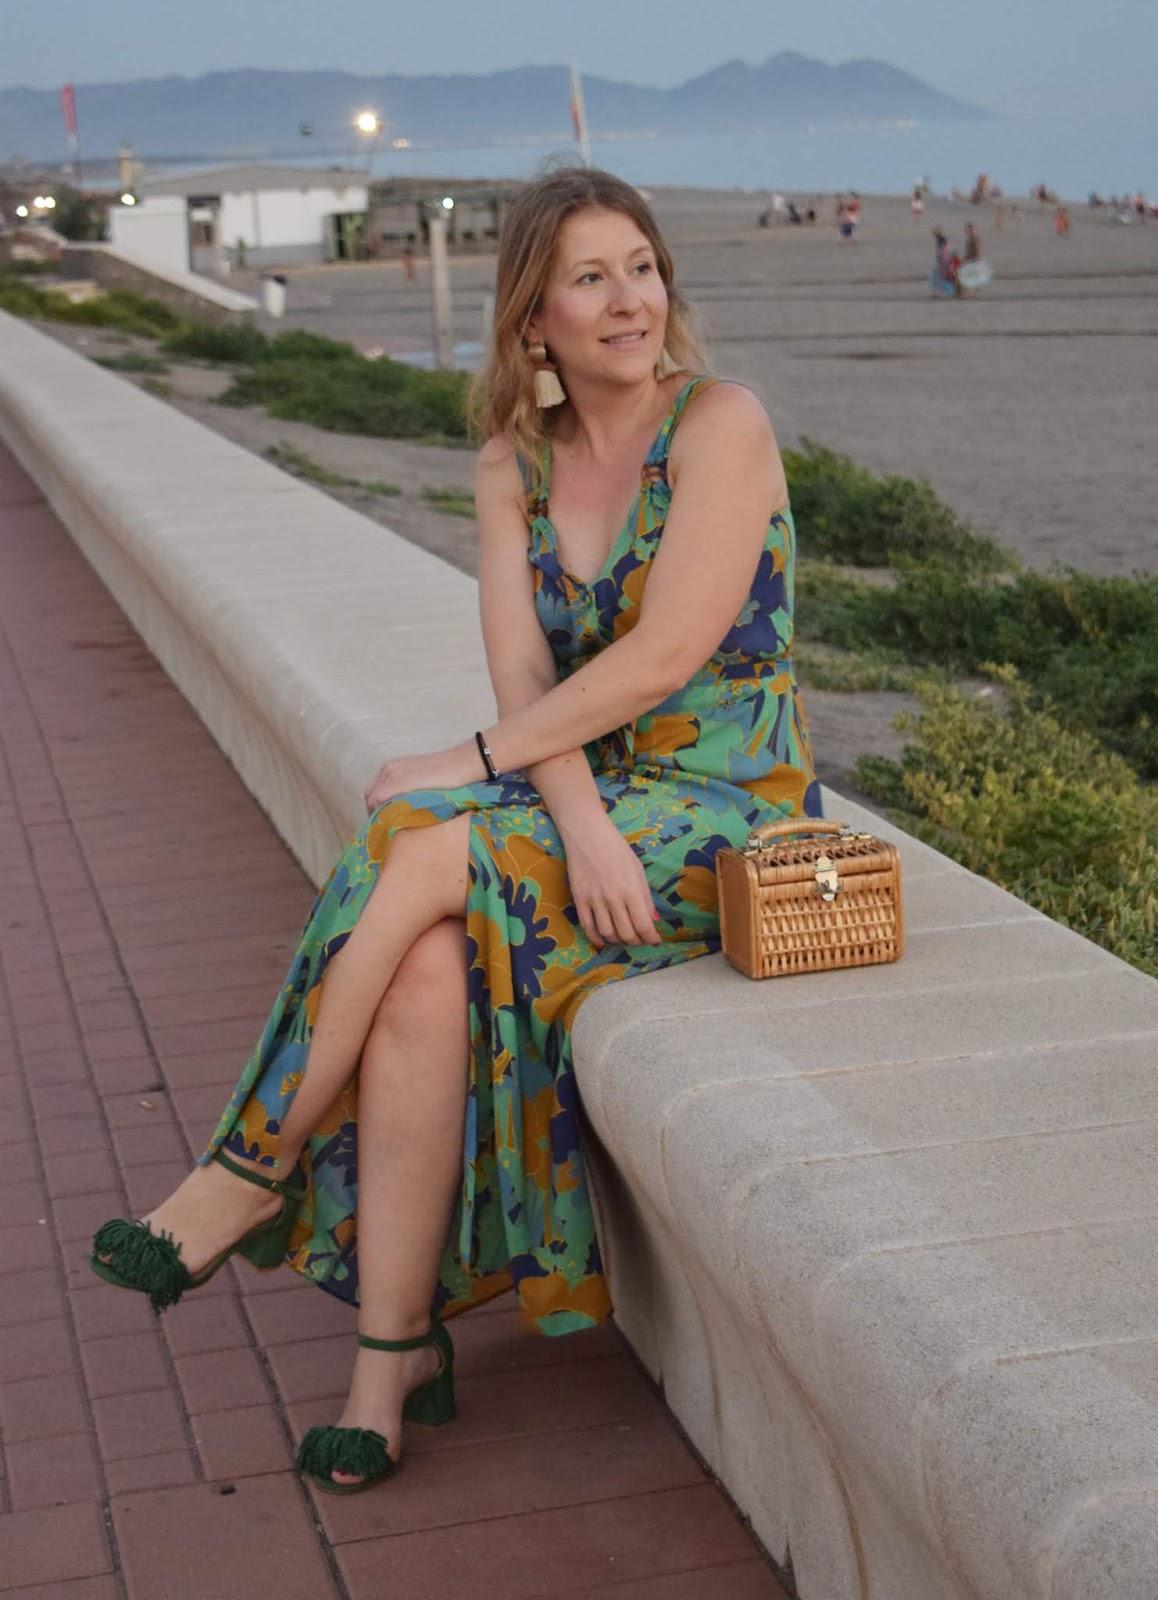 Vestido_vaporoso_noches_verano_summer_dress